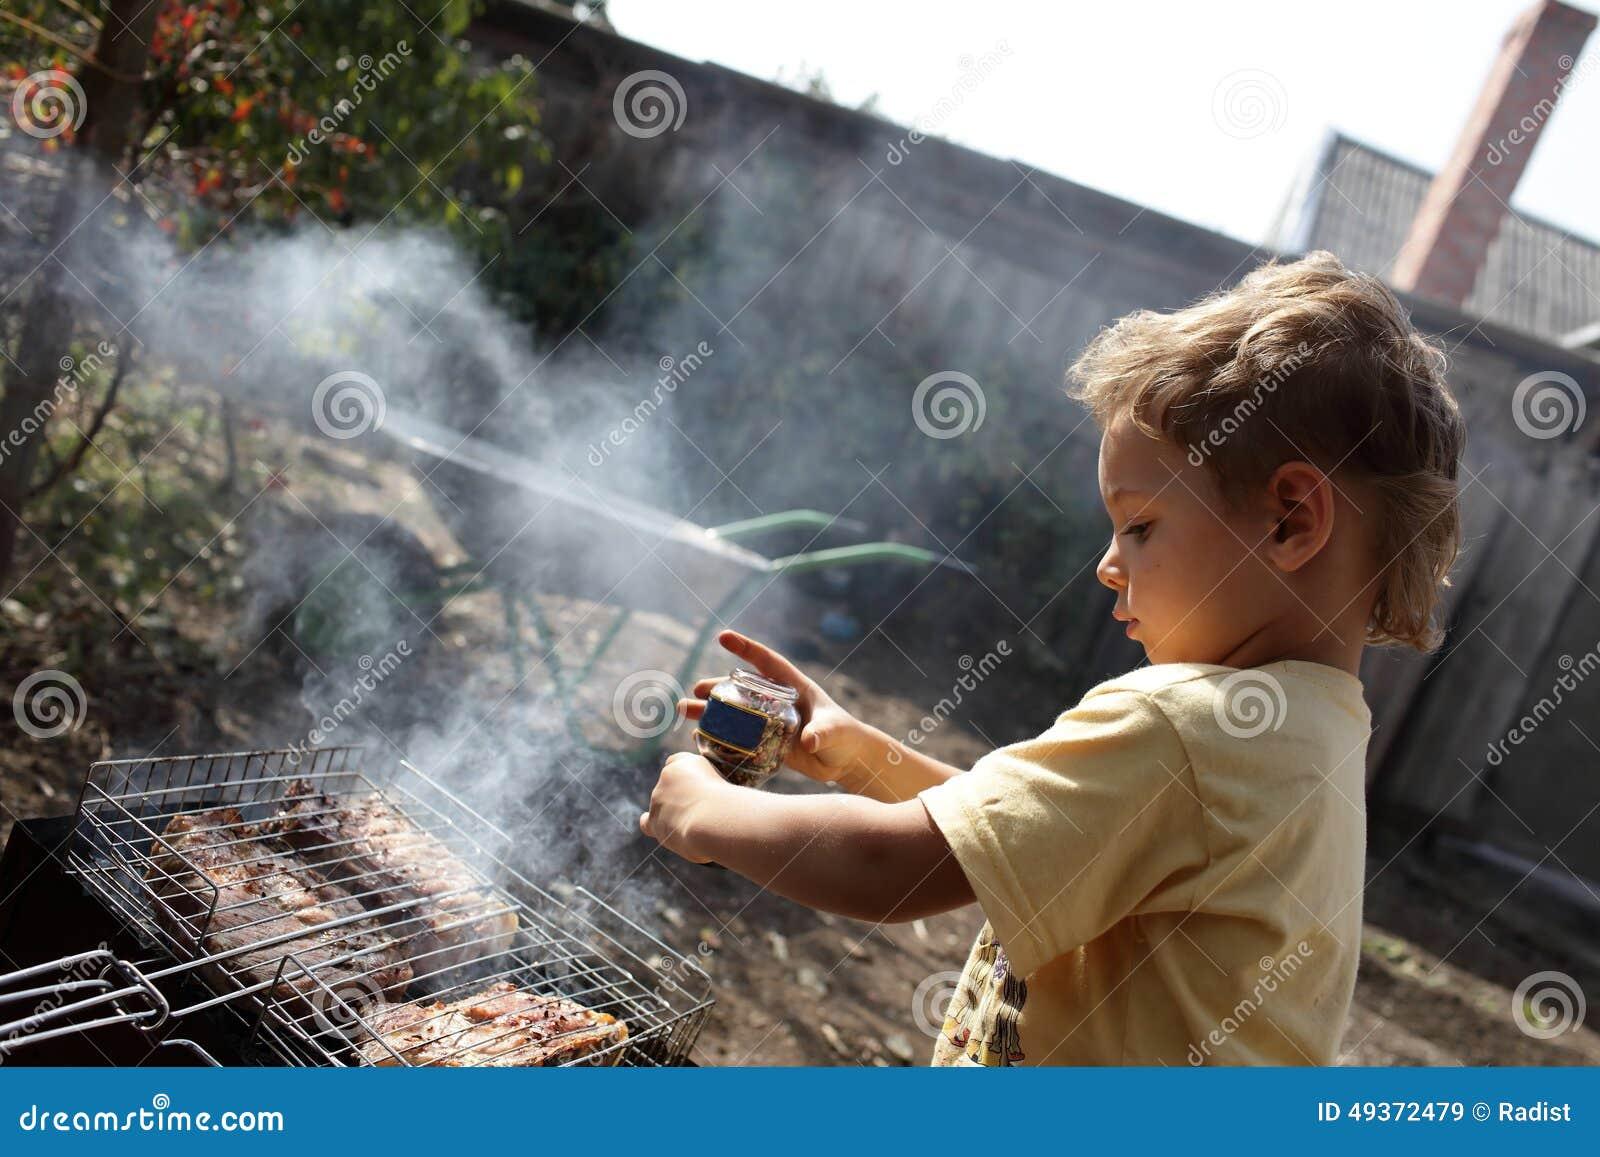 Boy Seasoning Pork Chops With Pepper Stock Image - Image of